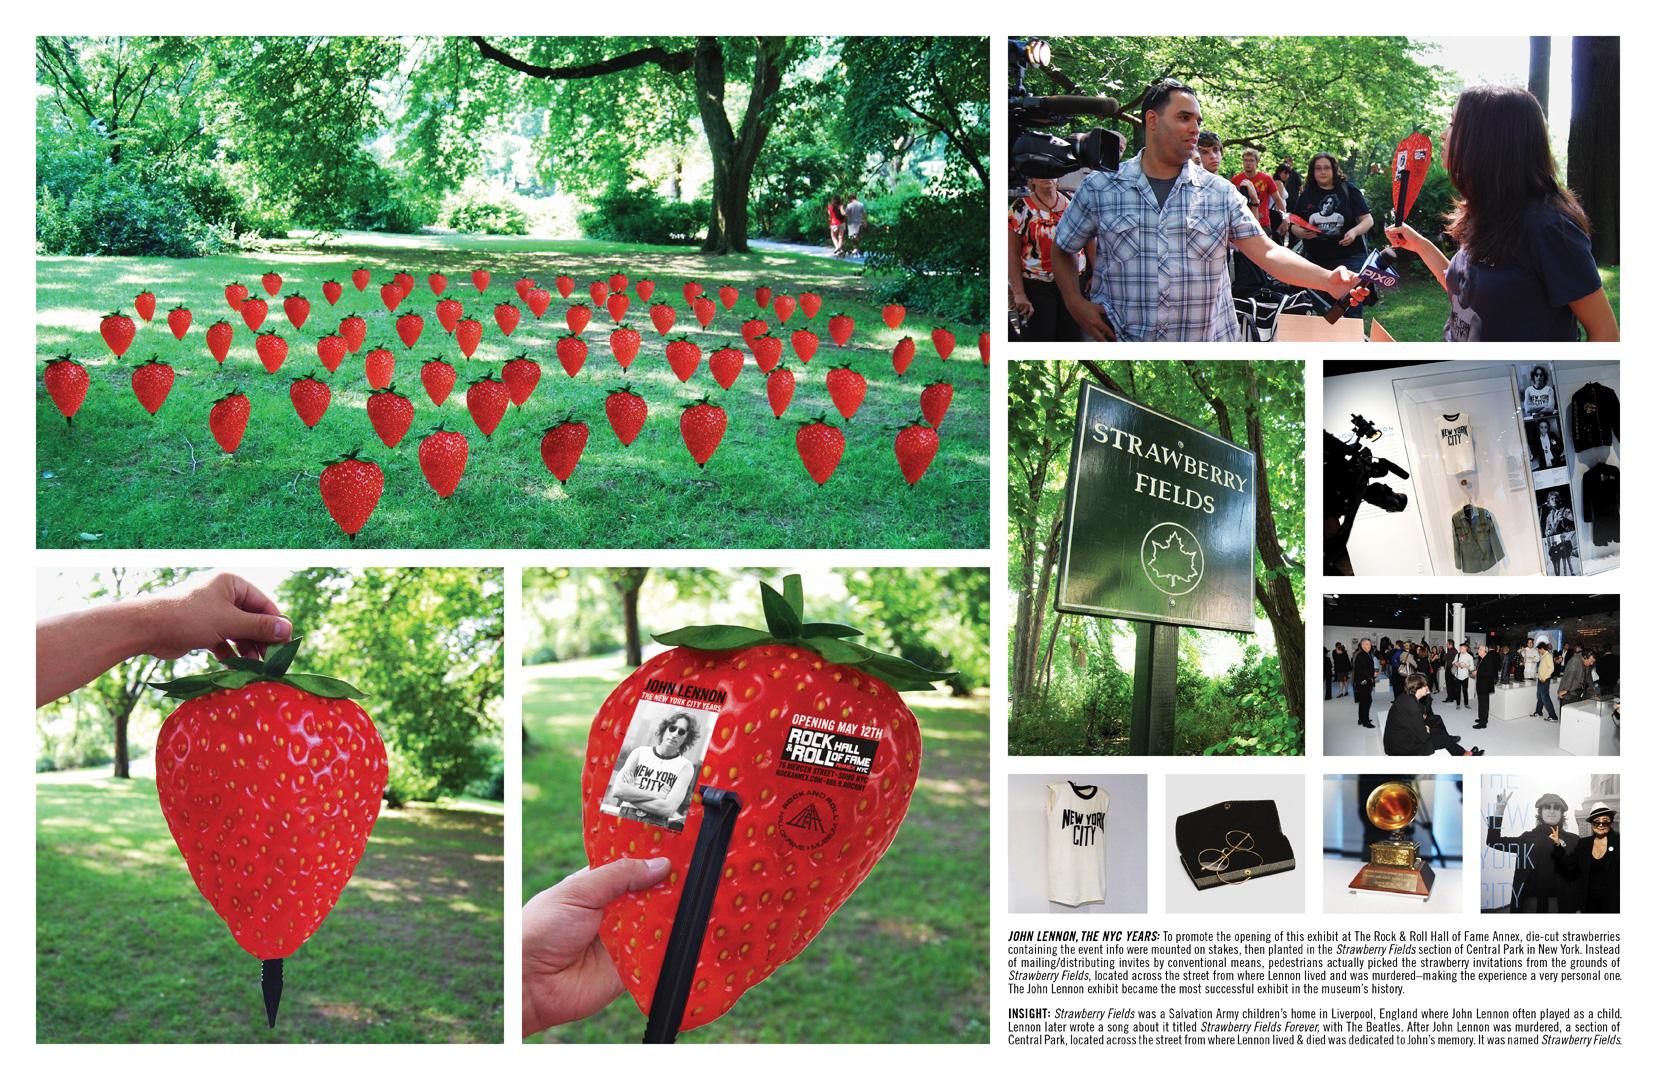 rock and roll hall of fame john lennon strawberry fields Земляничные поля в честь Джона Леннона